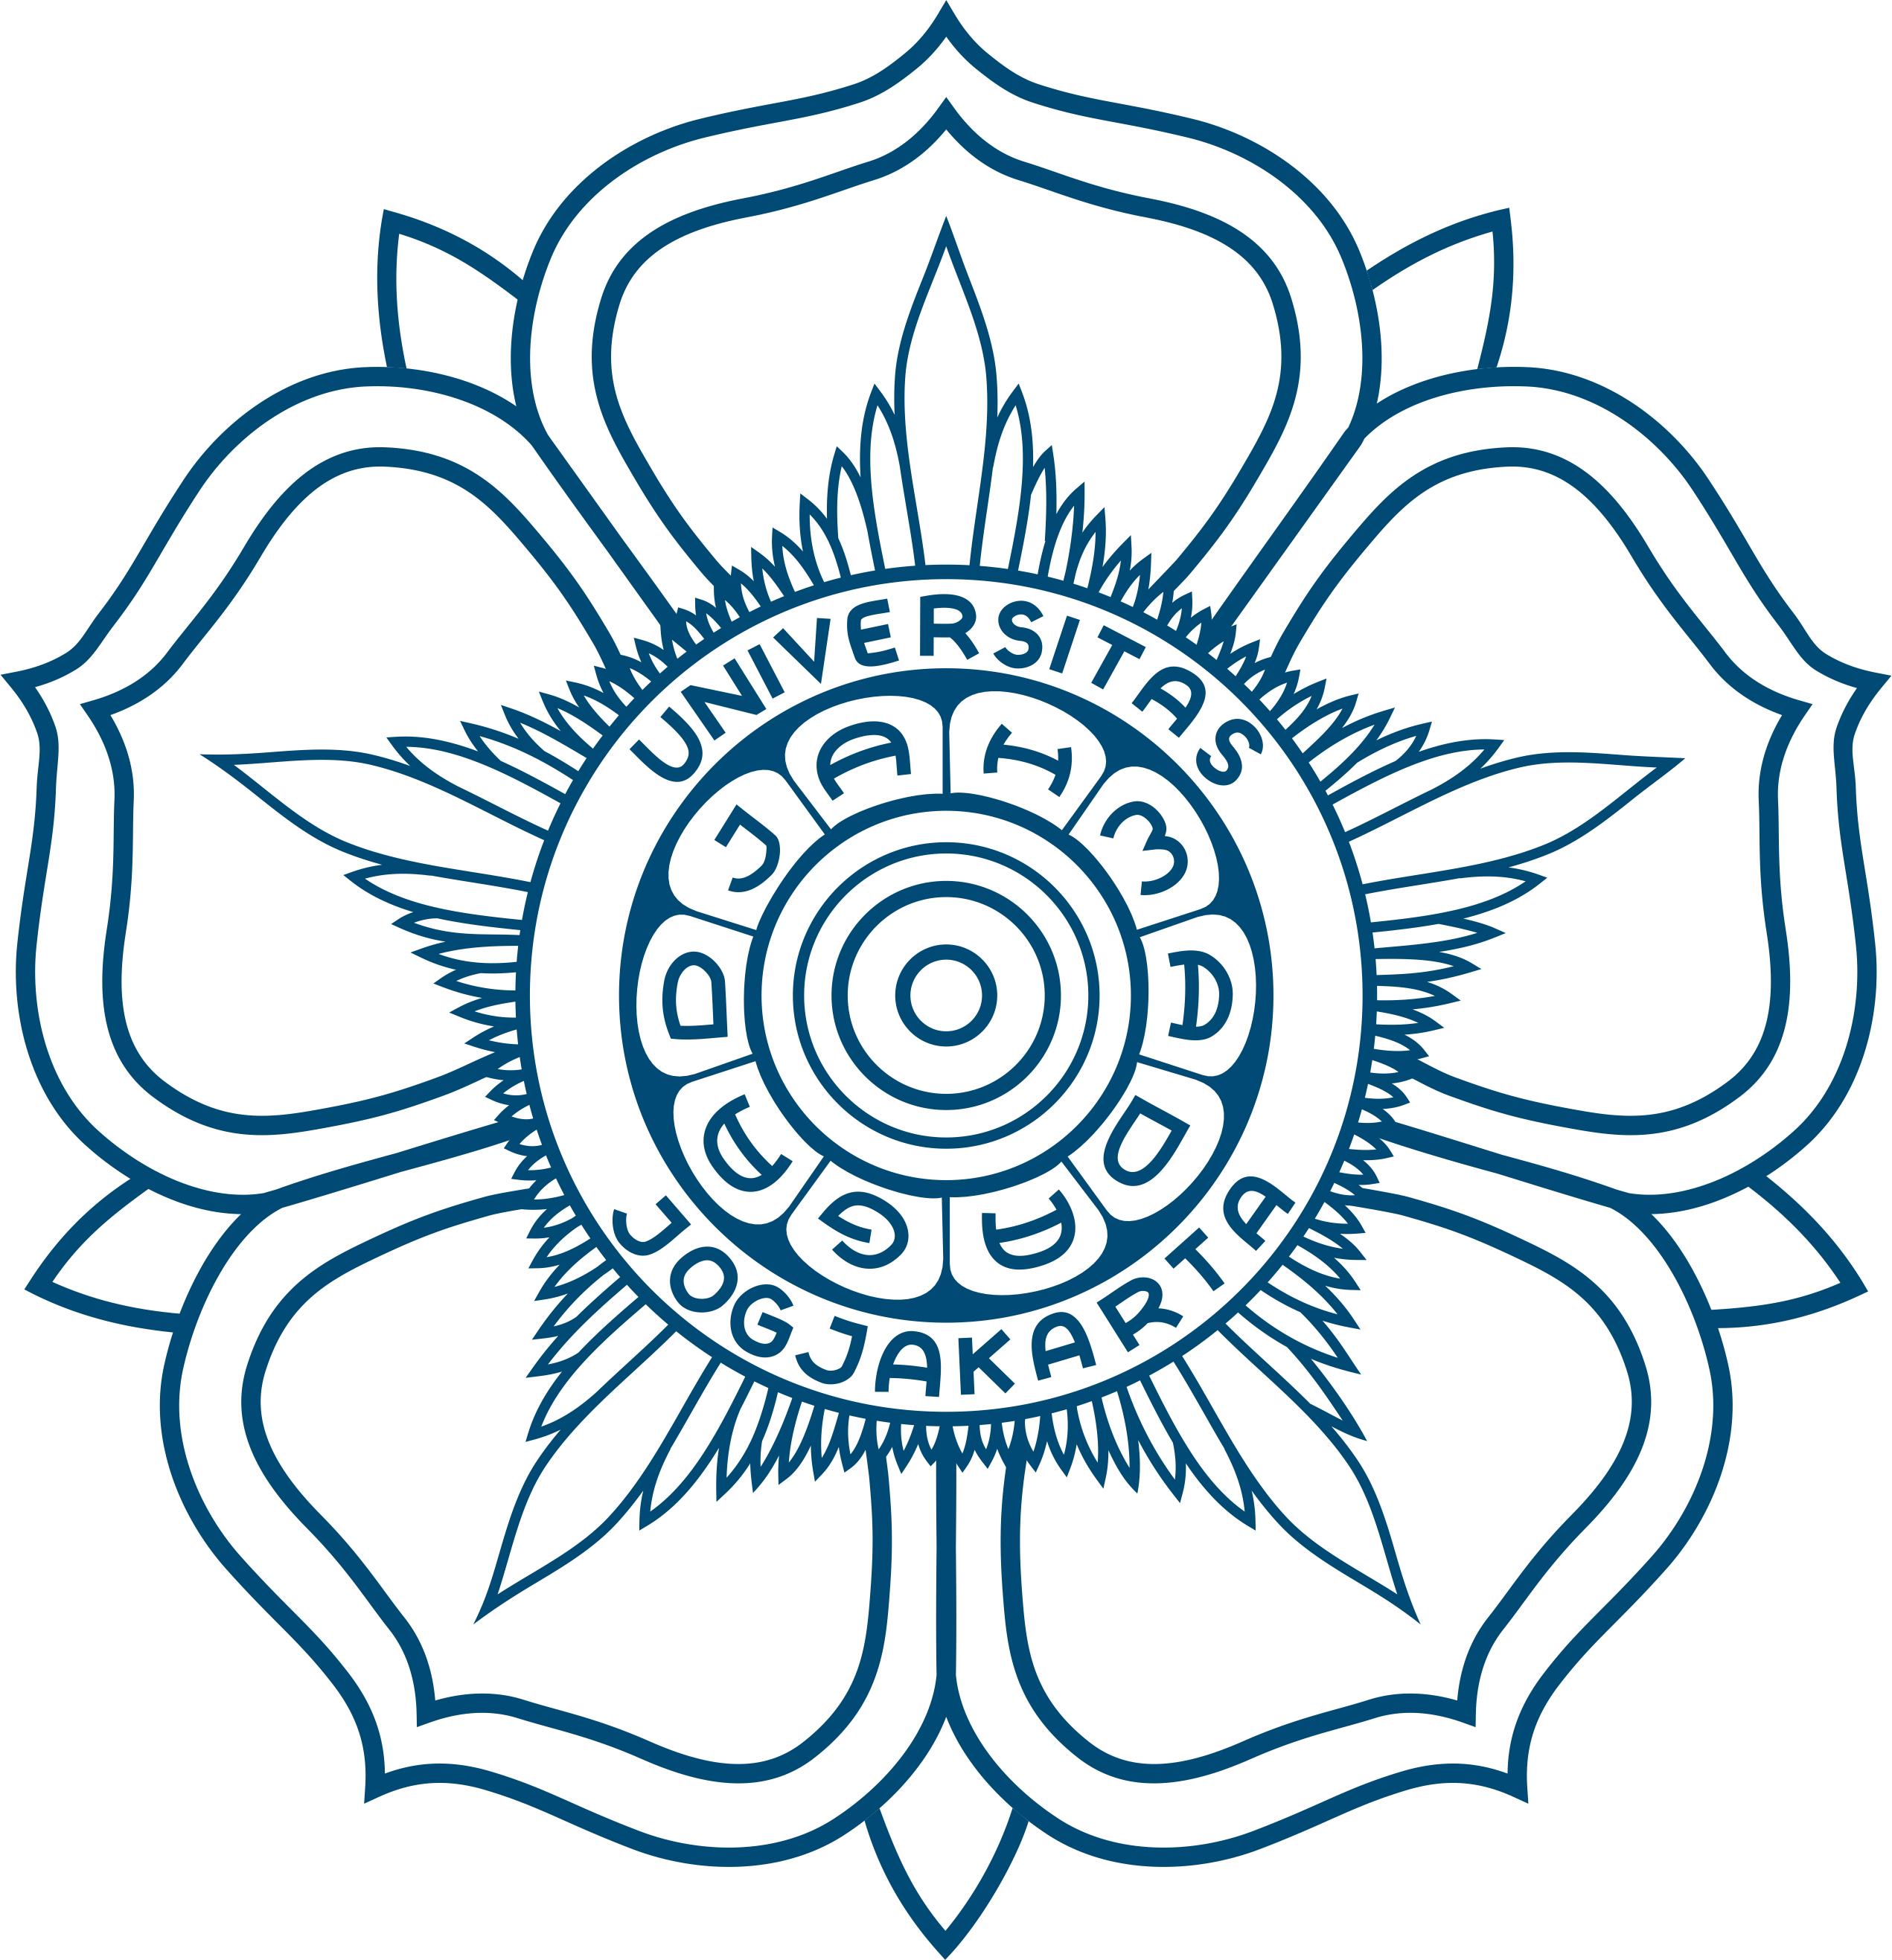 Logo UGM (Universitas Gadjah Mada) Warna Biru